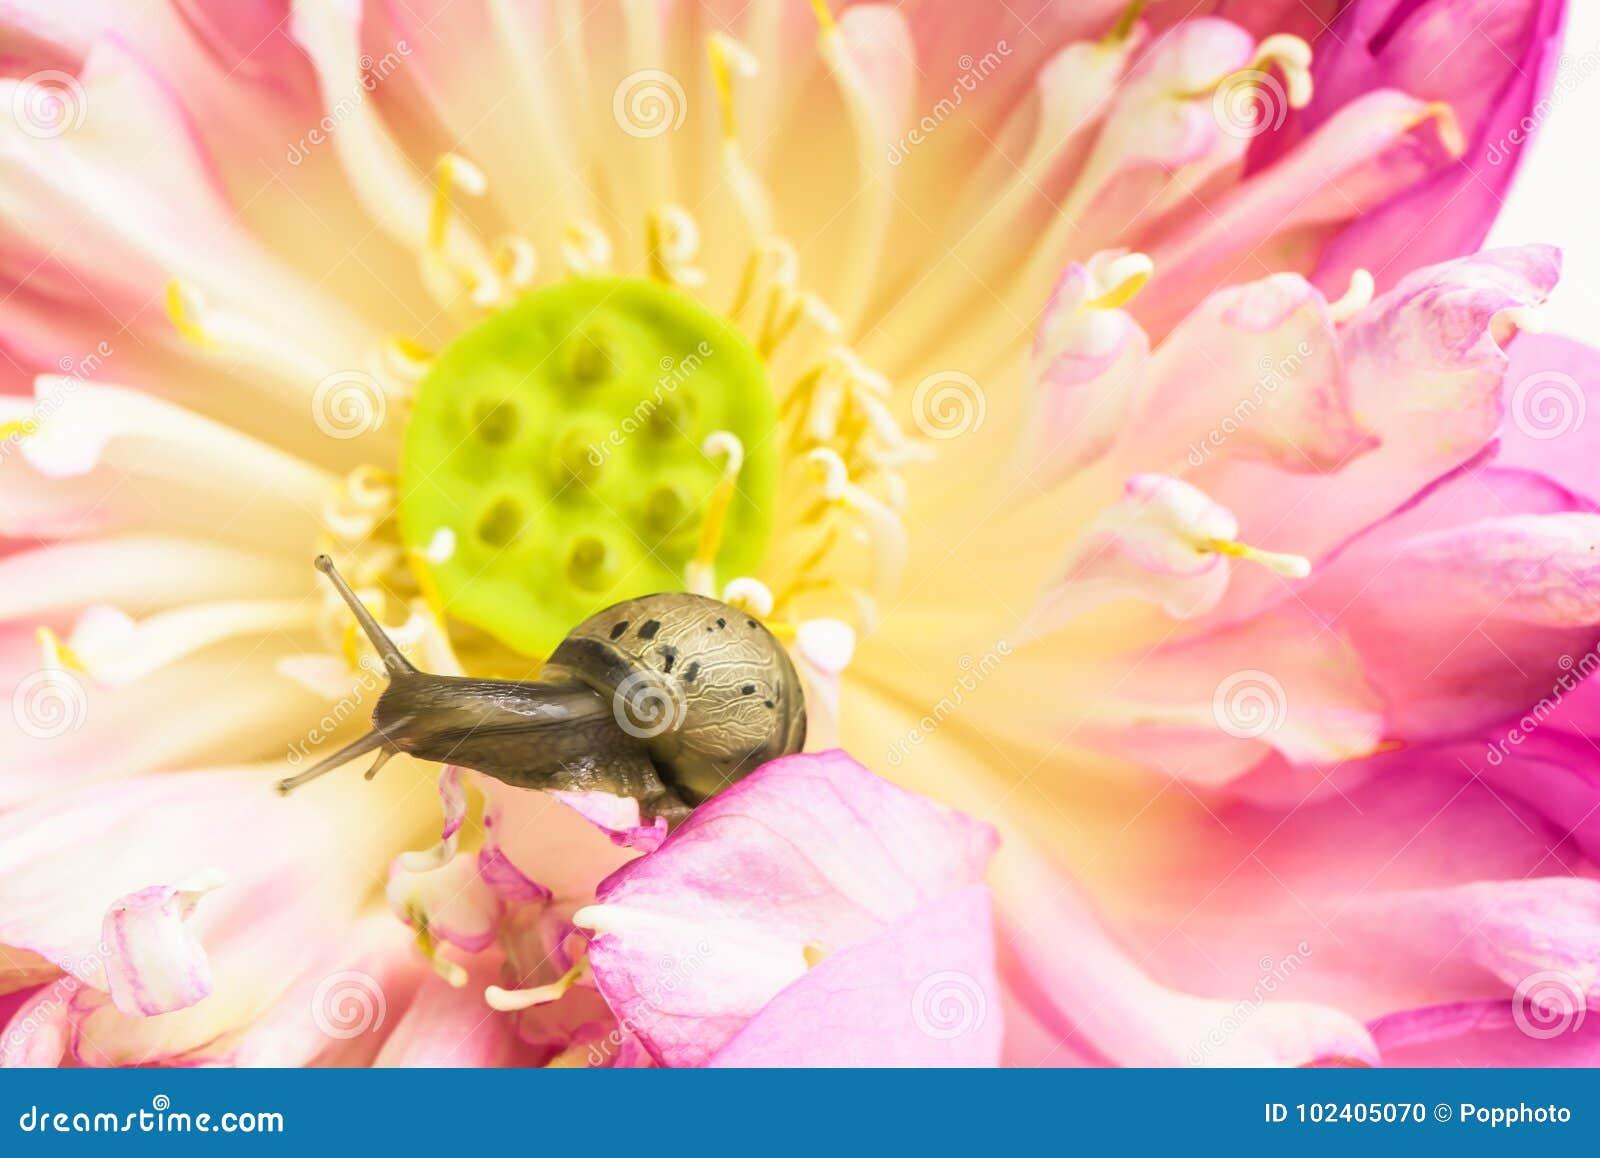 Sluit omhoog van slak op lotusbloembloemen